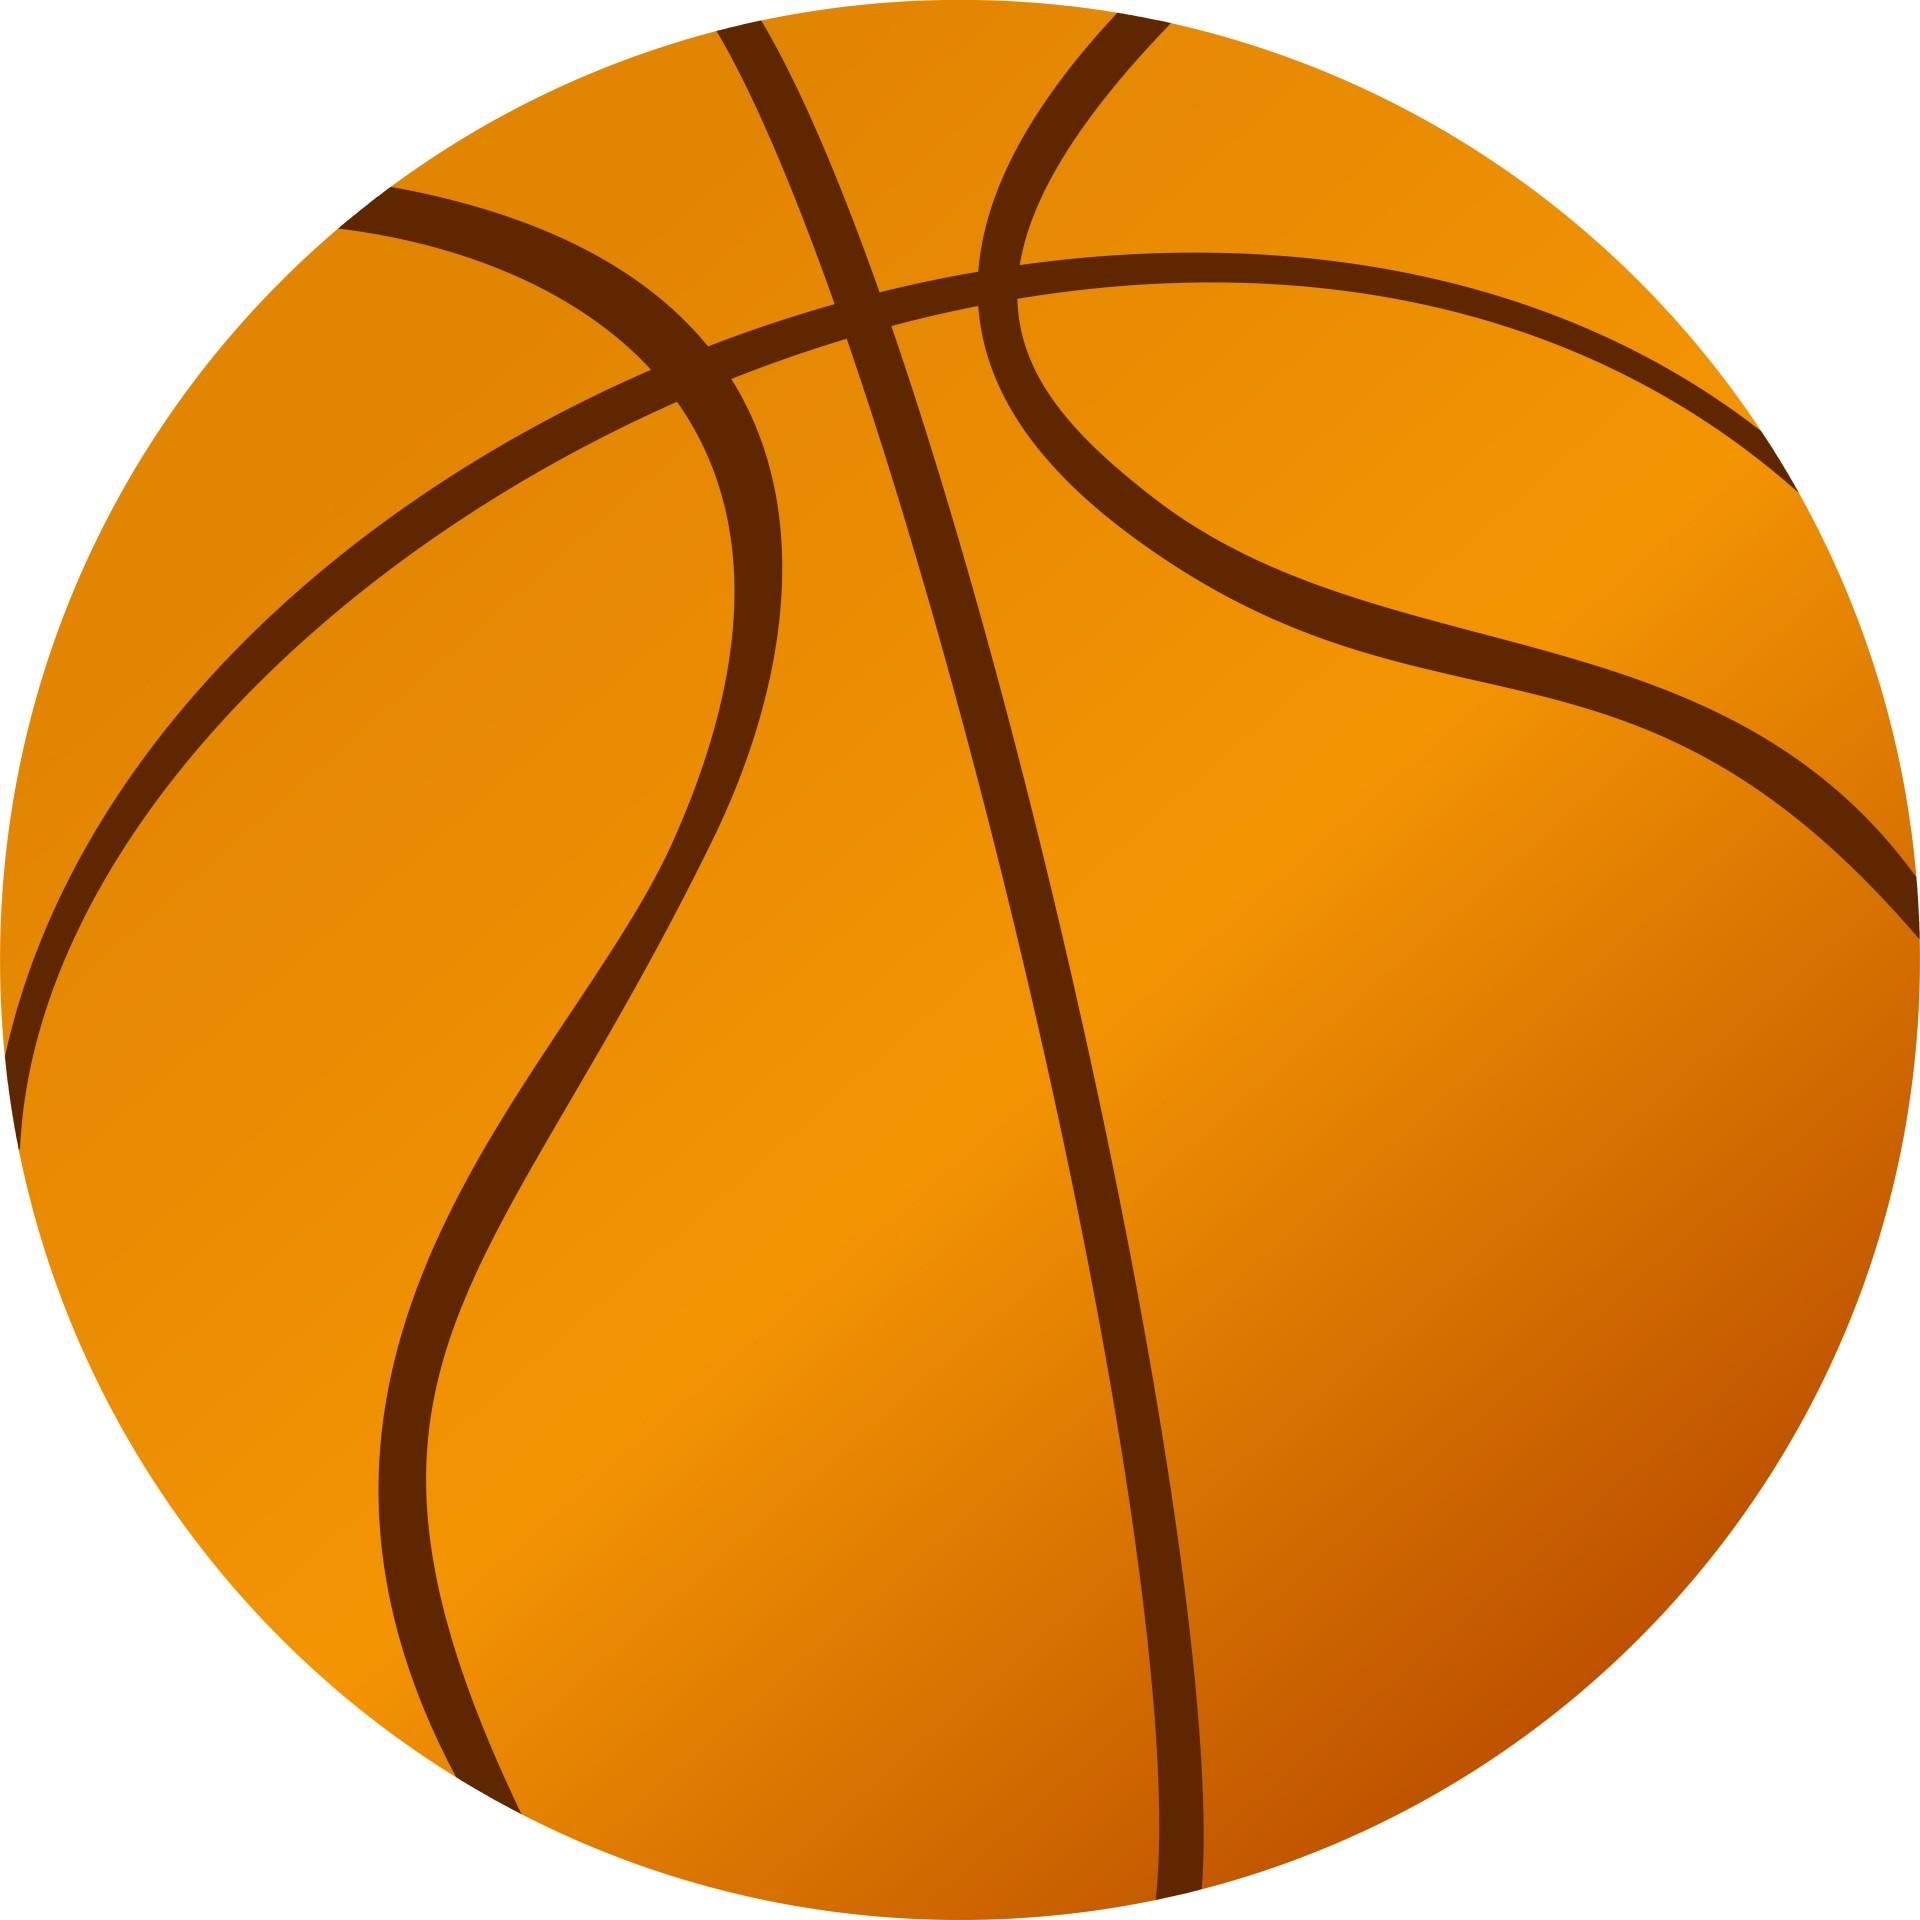 1920x1920 Basketball Ball Free Stock Photo